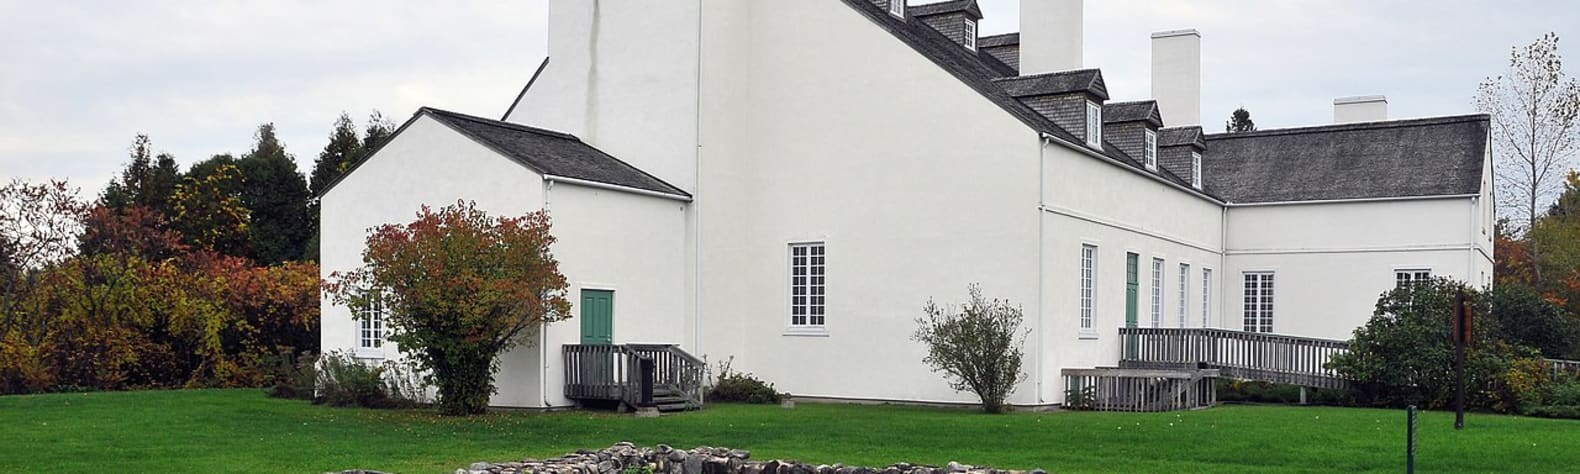 Forges du Saint-Maurice National Historic Site